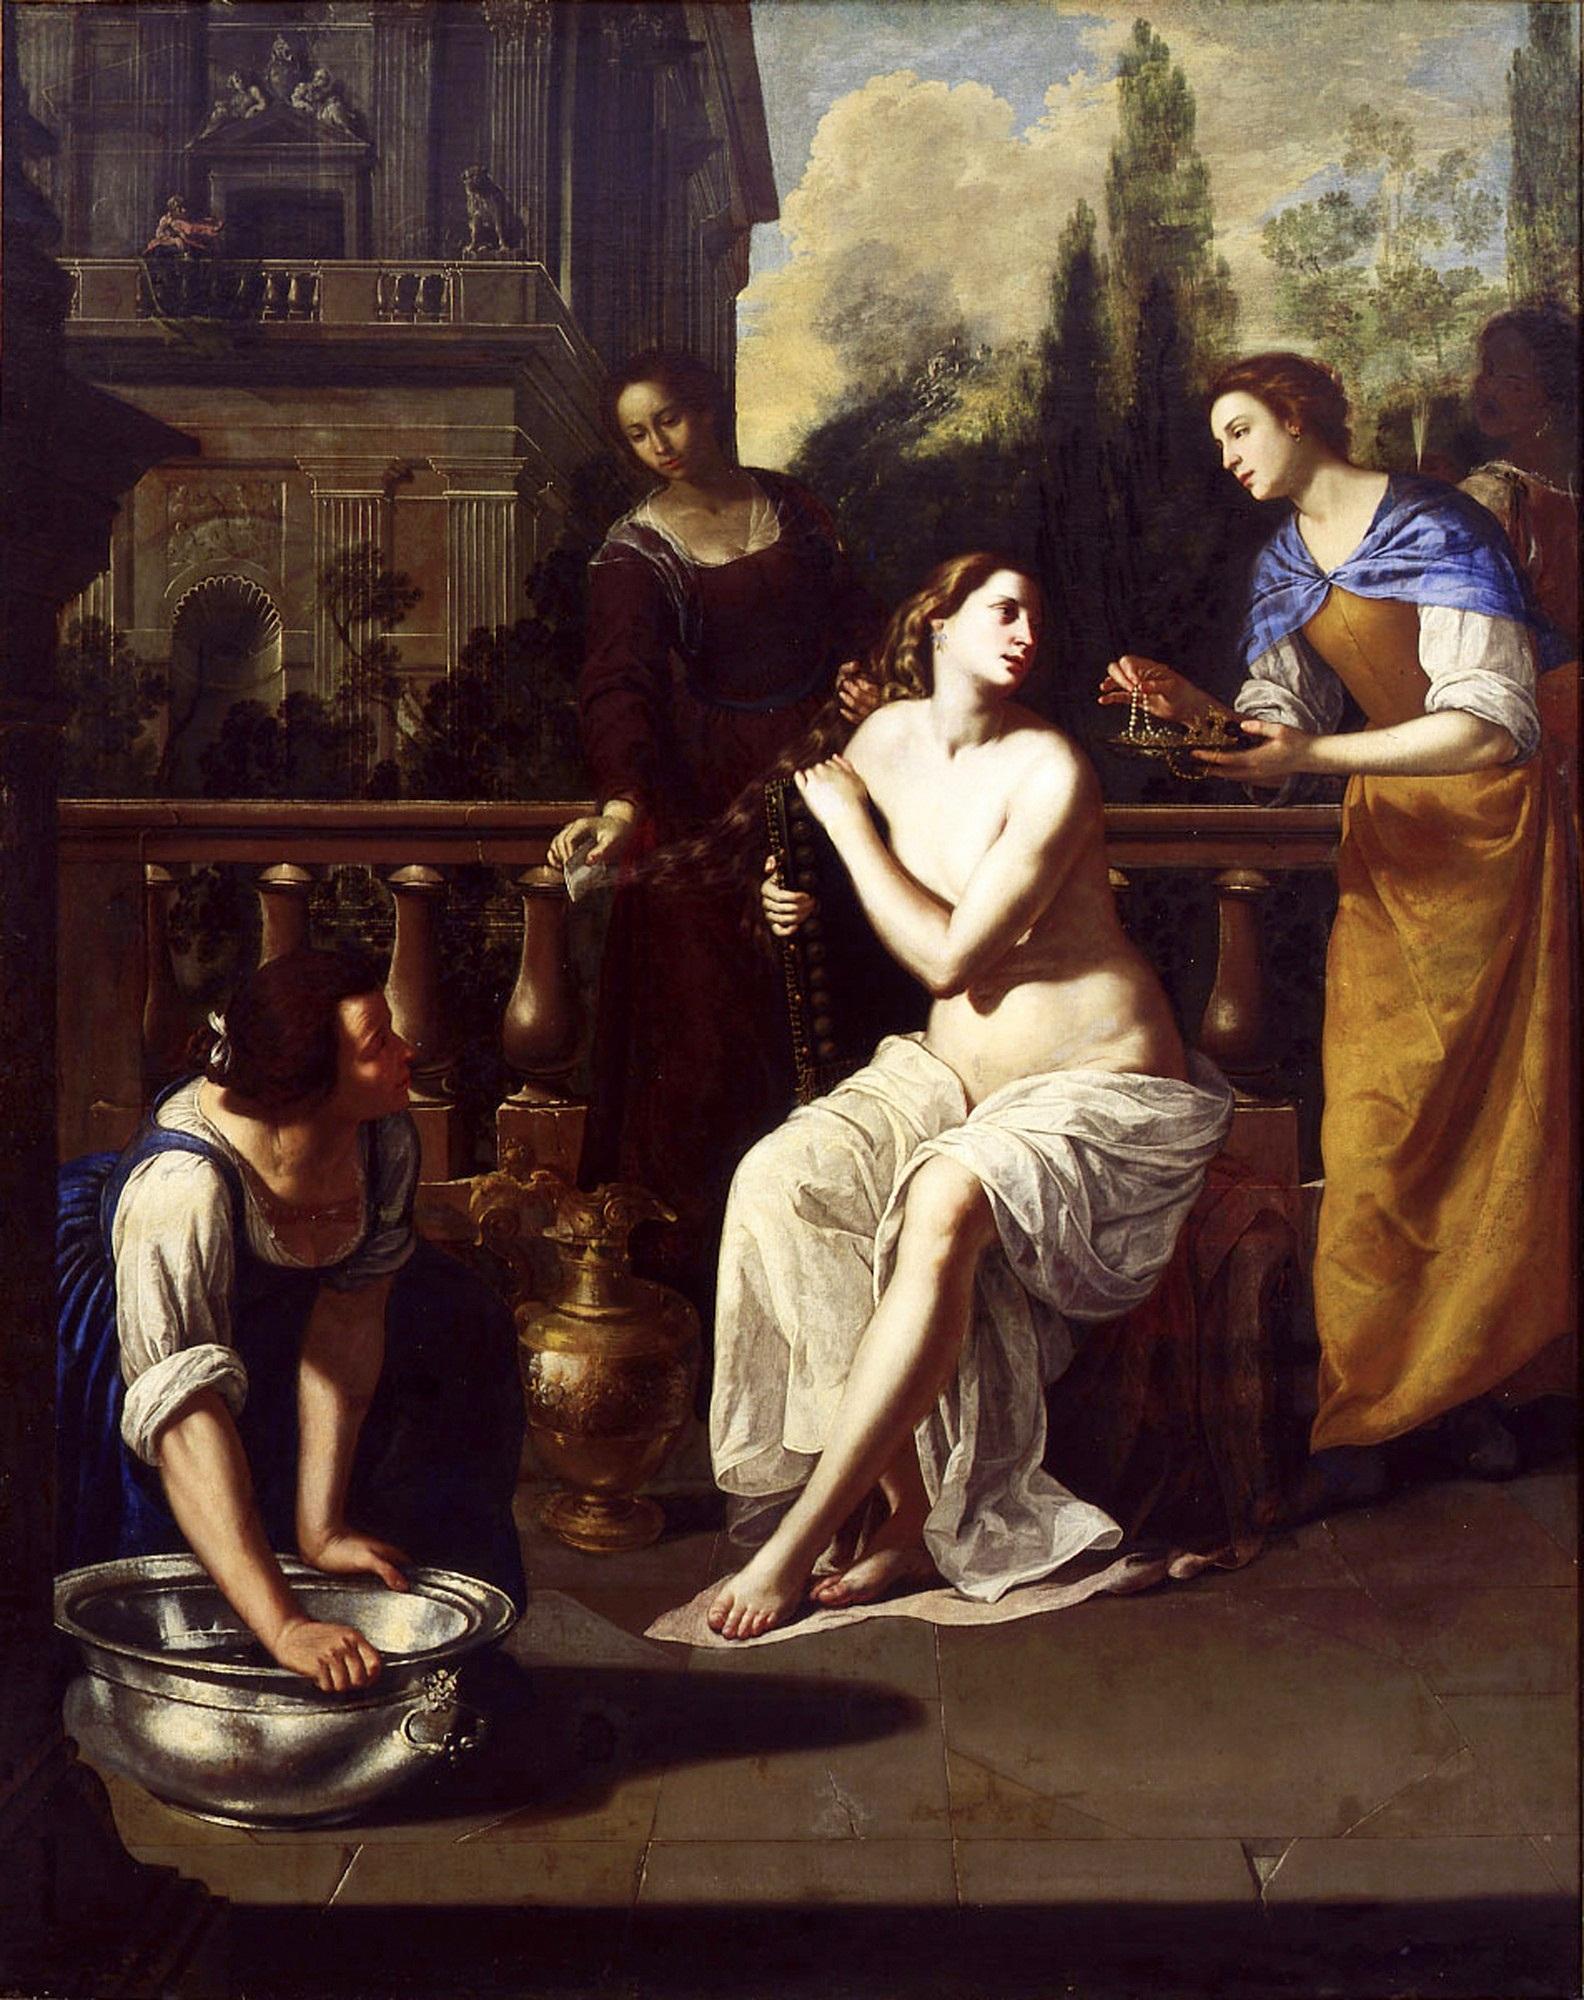 Artemisia Gentileschi, Public domain